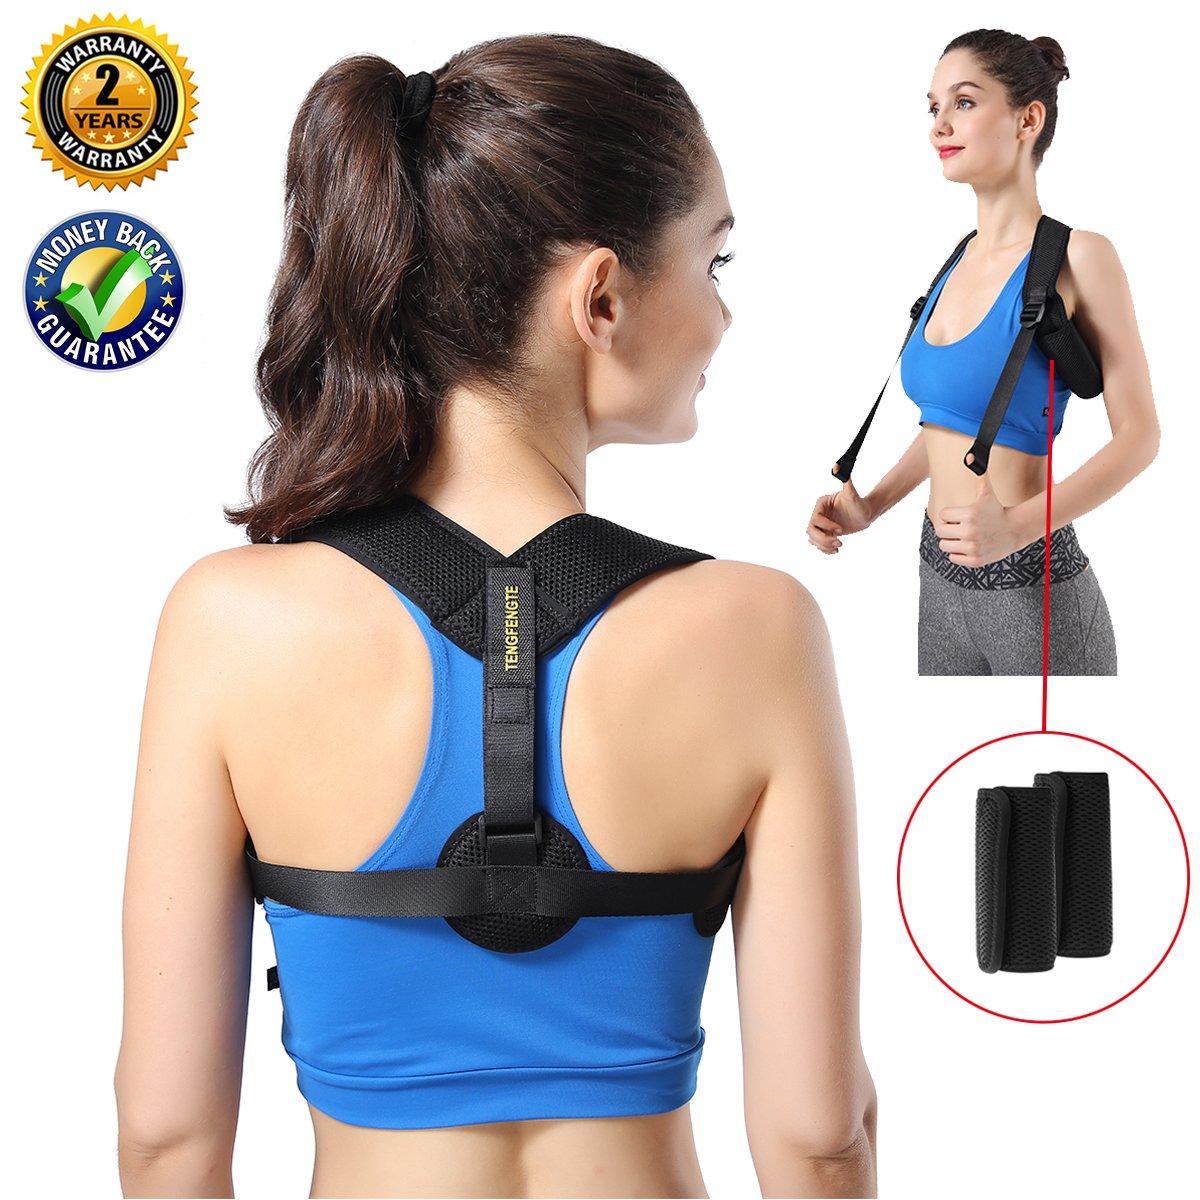 Posture Corrector for Women Men- Back Brace Posture Corrector Effective and Comfortable Adjustable - Posture Braces - Breathable Posture under Clothes   Support - Back Brace - Back Straightener